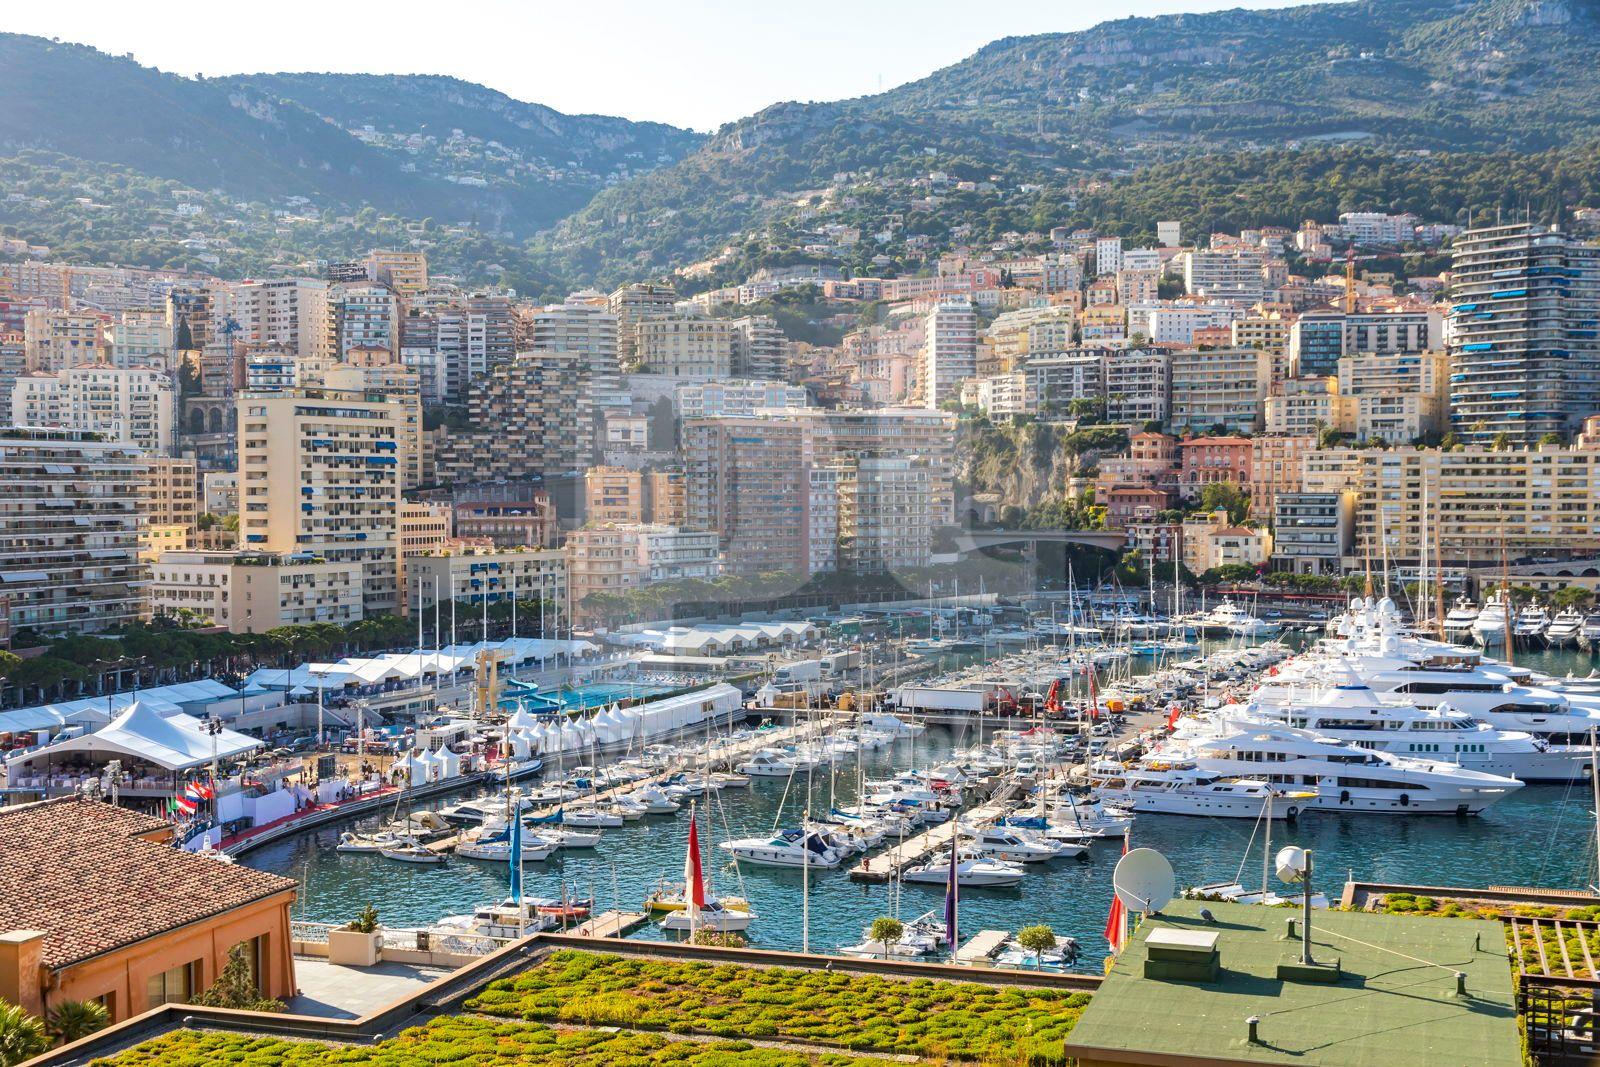 City of Monte Carlo skyline view Monaco French Riviera, 16477, Architecture  — PoweredTemplate.com